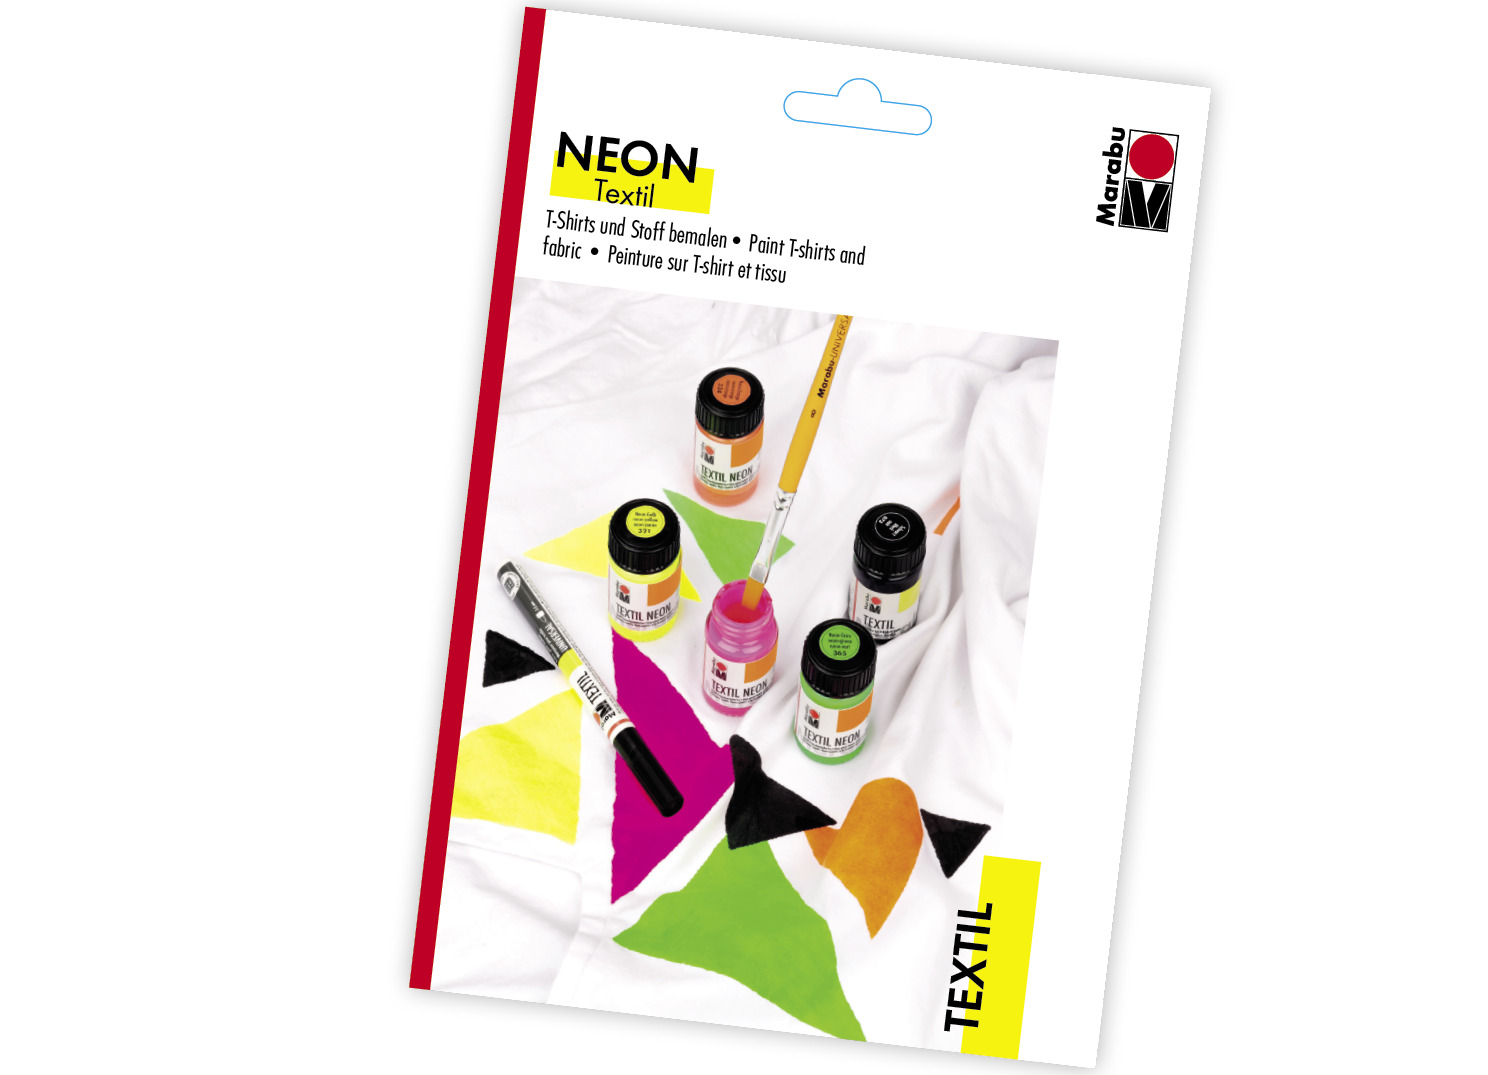 Marabu-Textil-Print-Colouring-Neon-Title.jpg